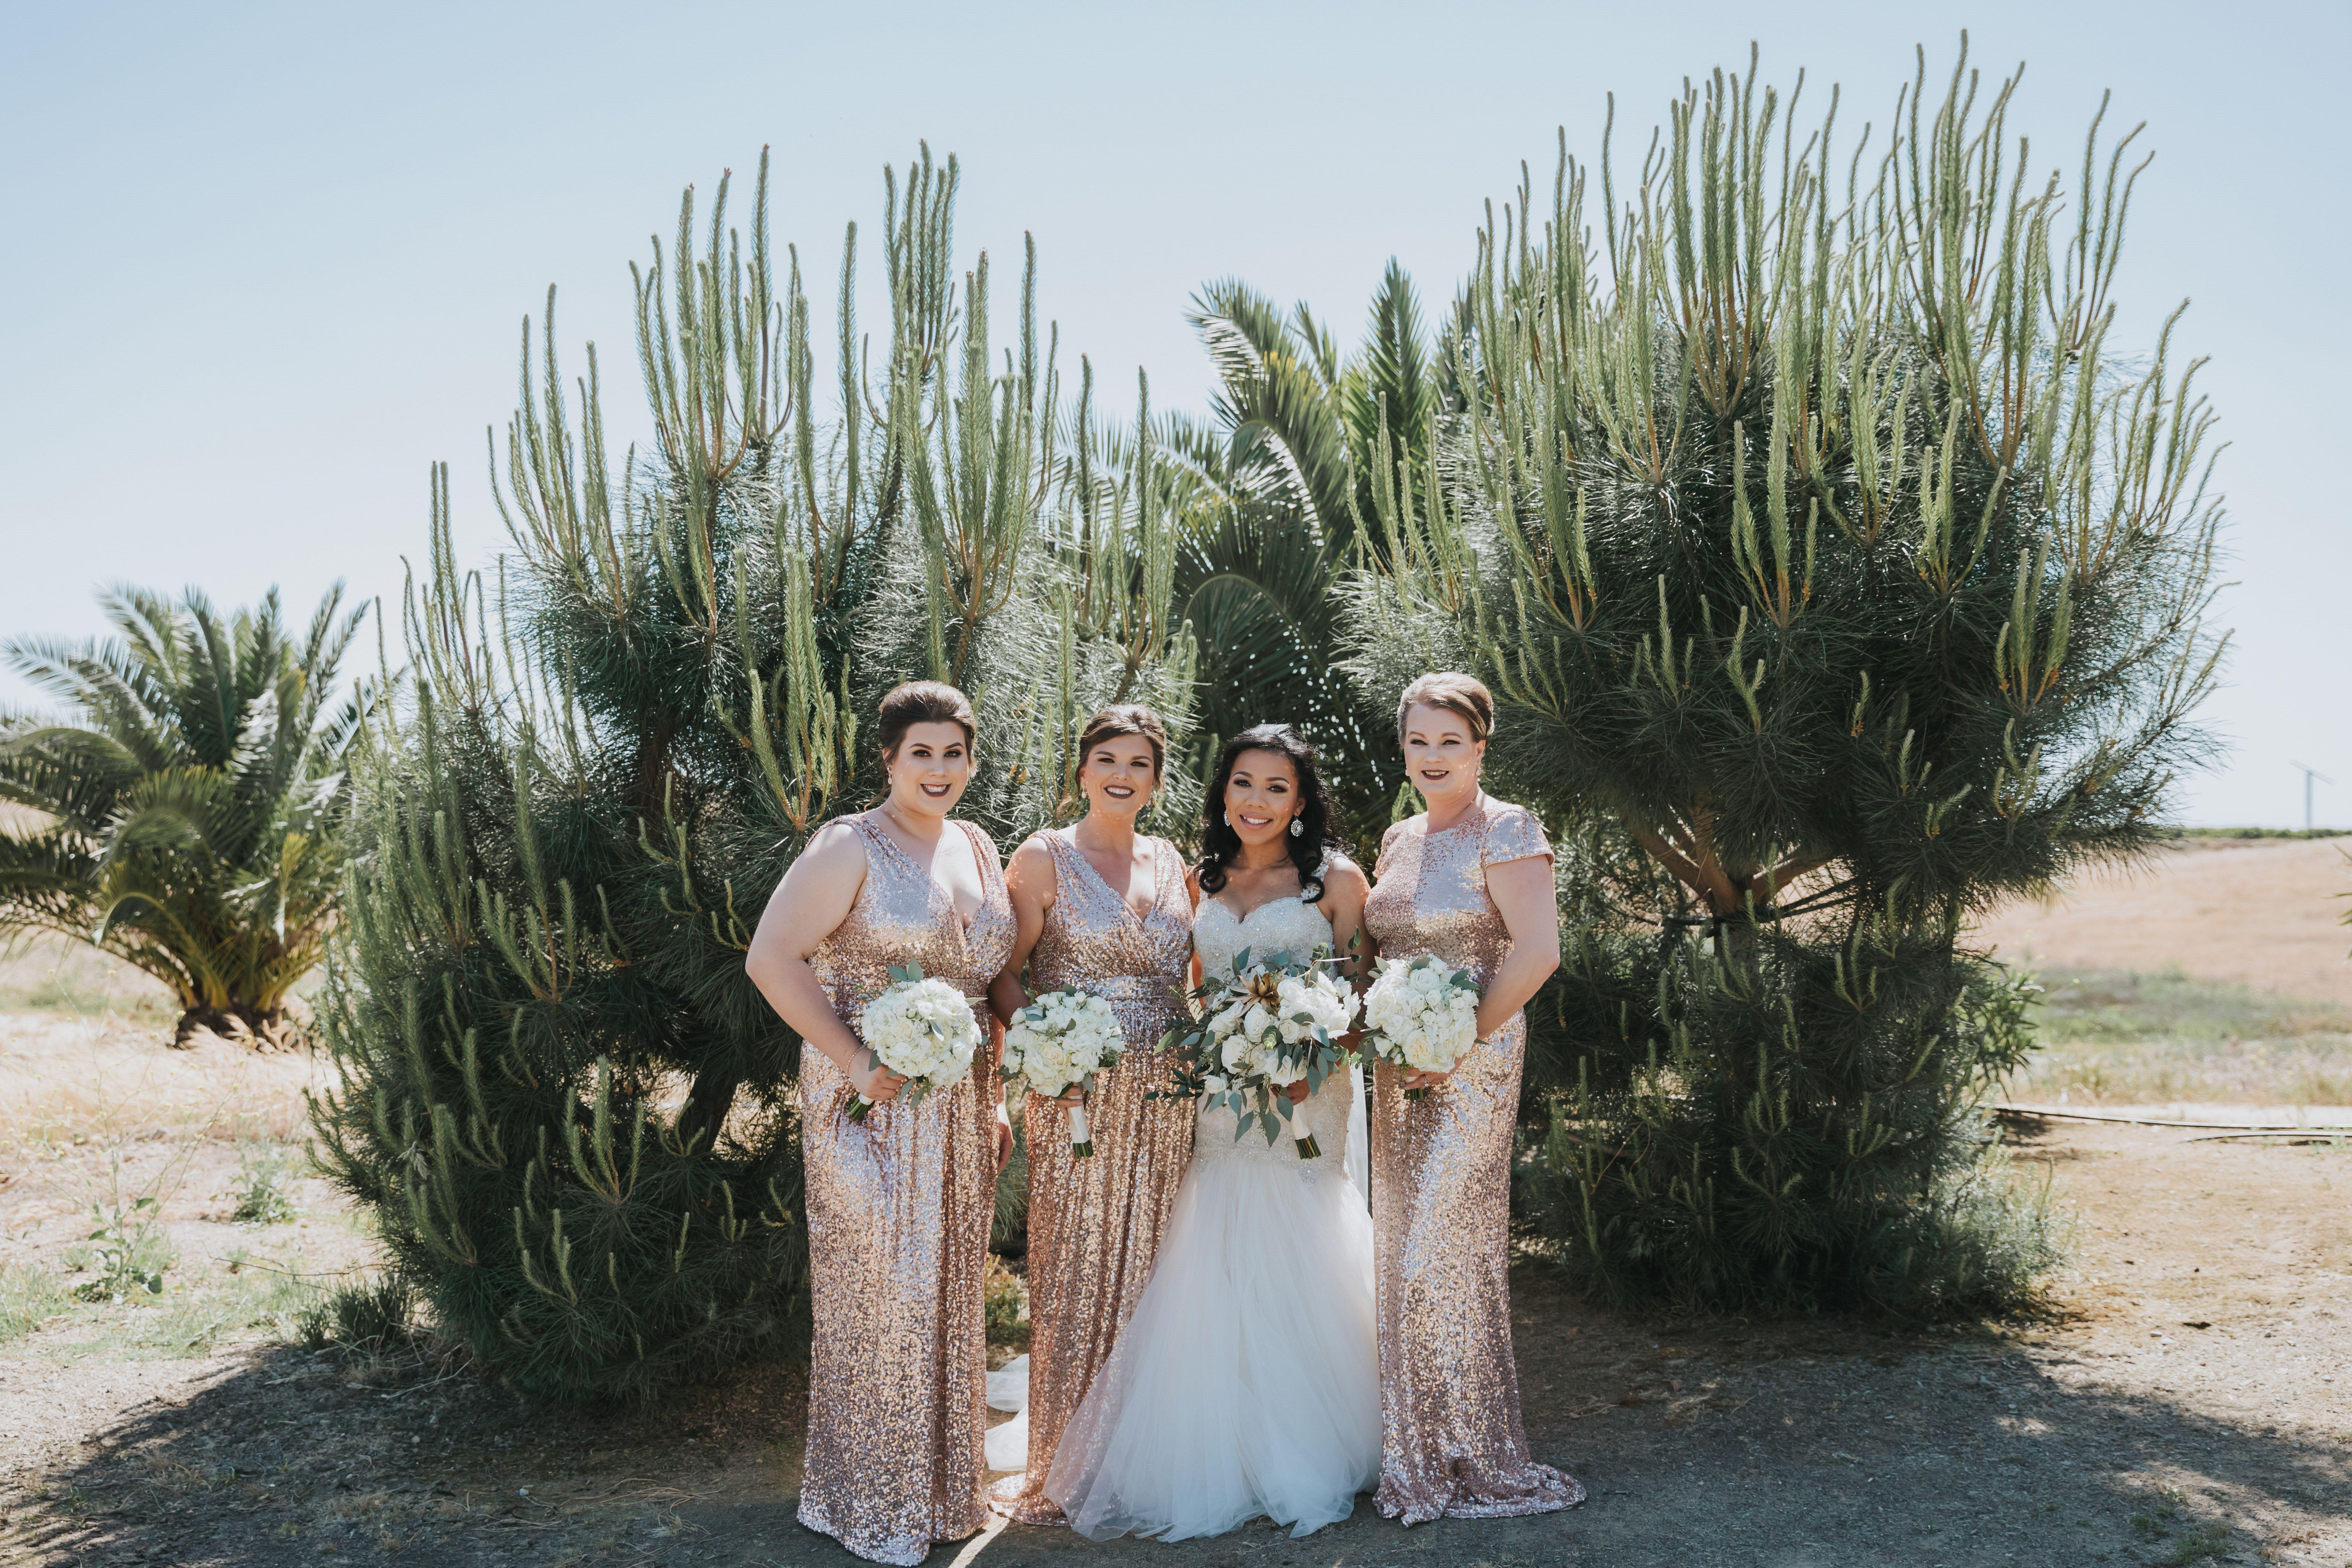 Wedding ideas for summer  wedding photography  wedding photography ideas  summer wedding